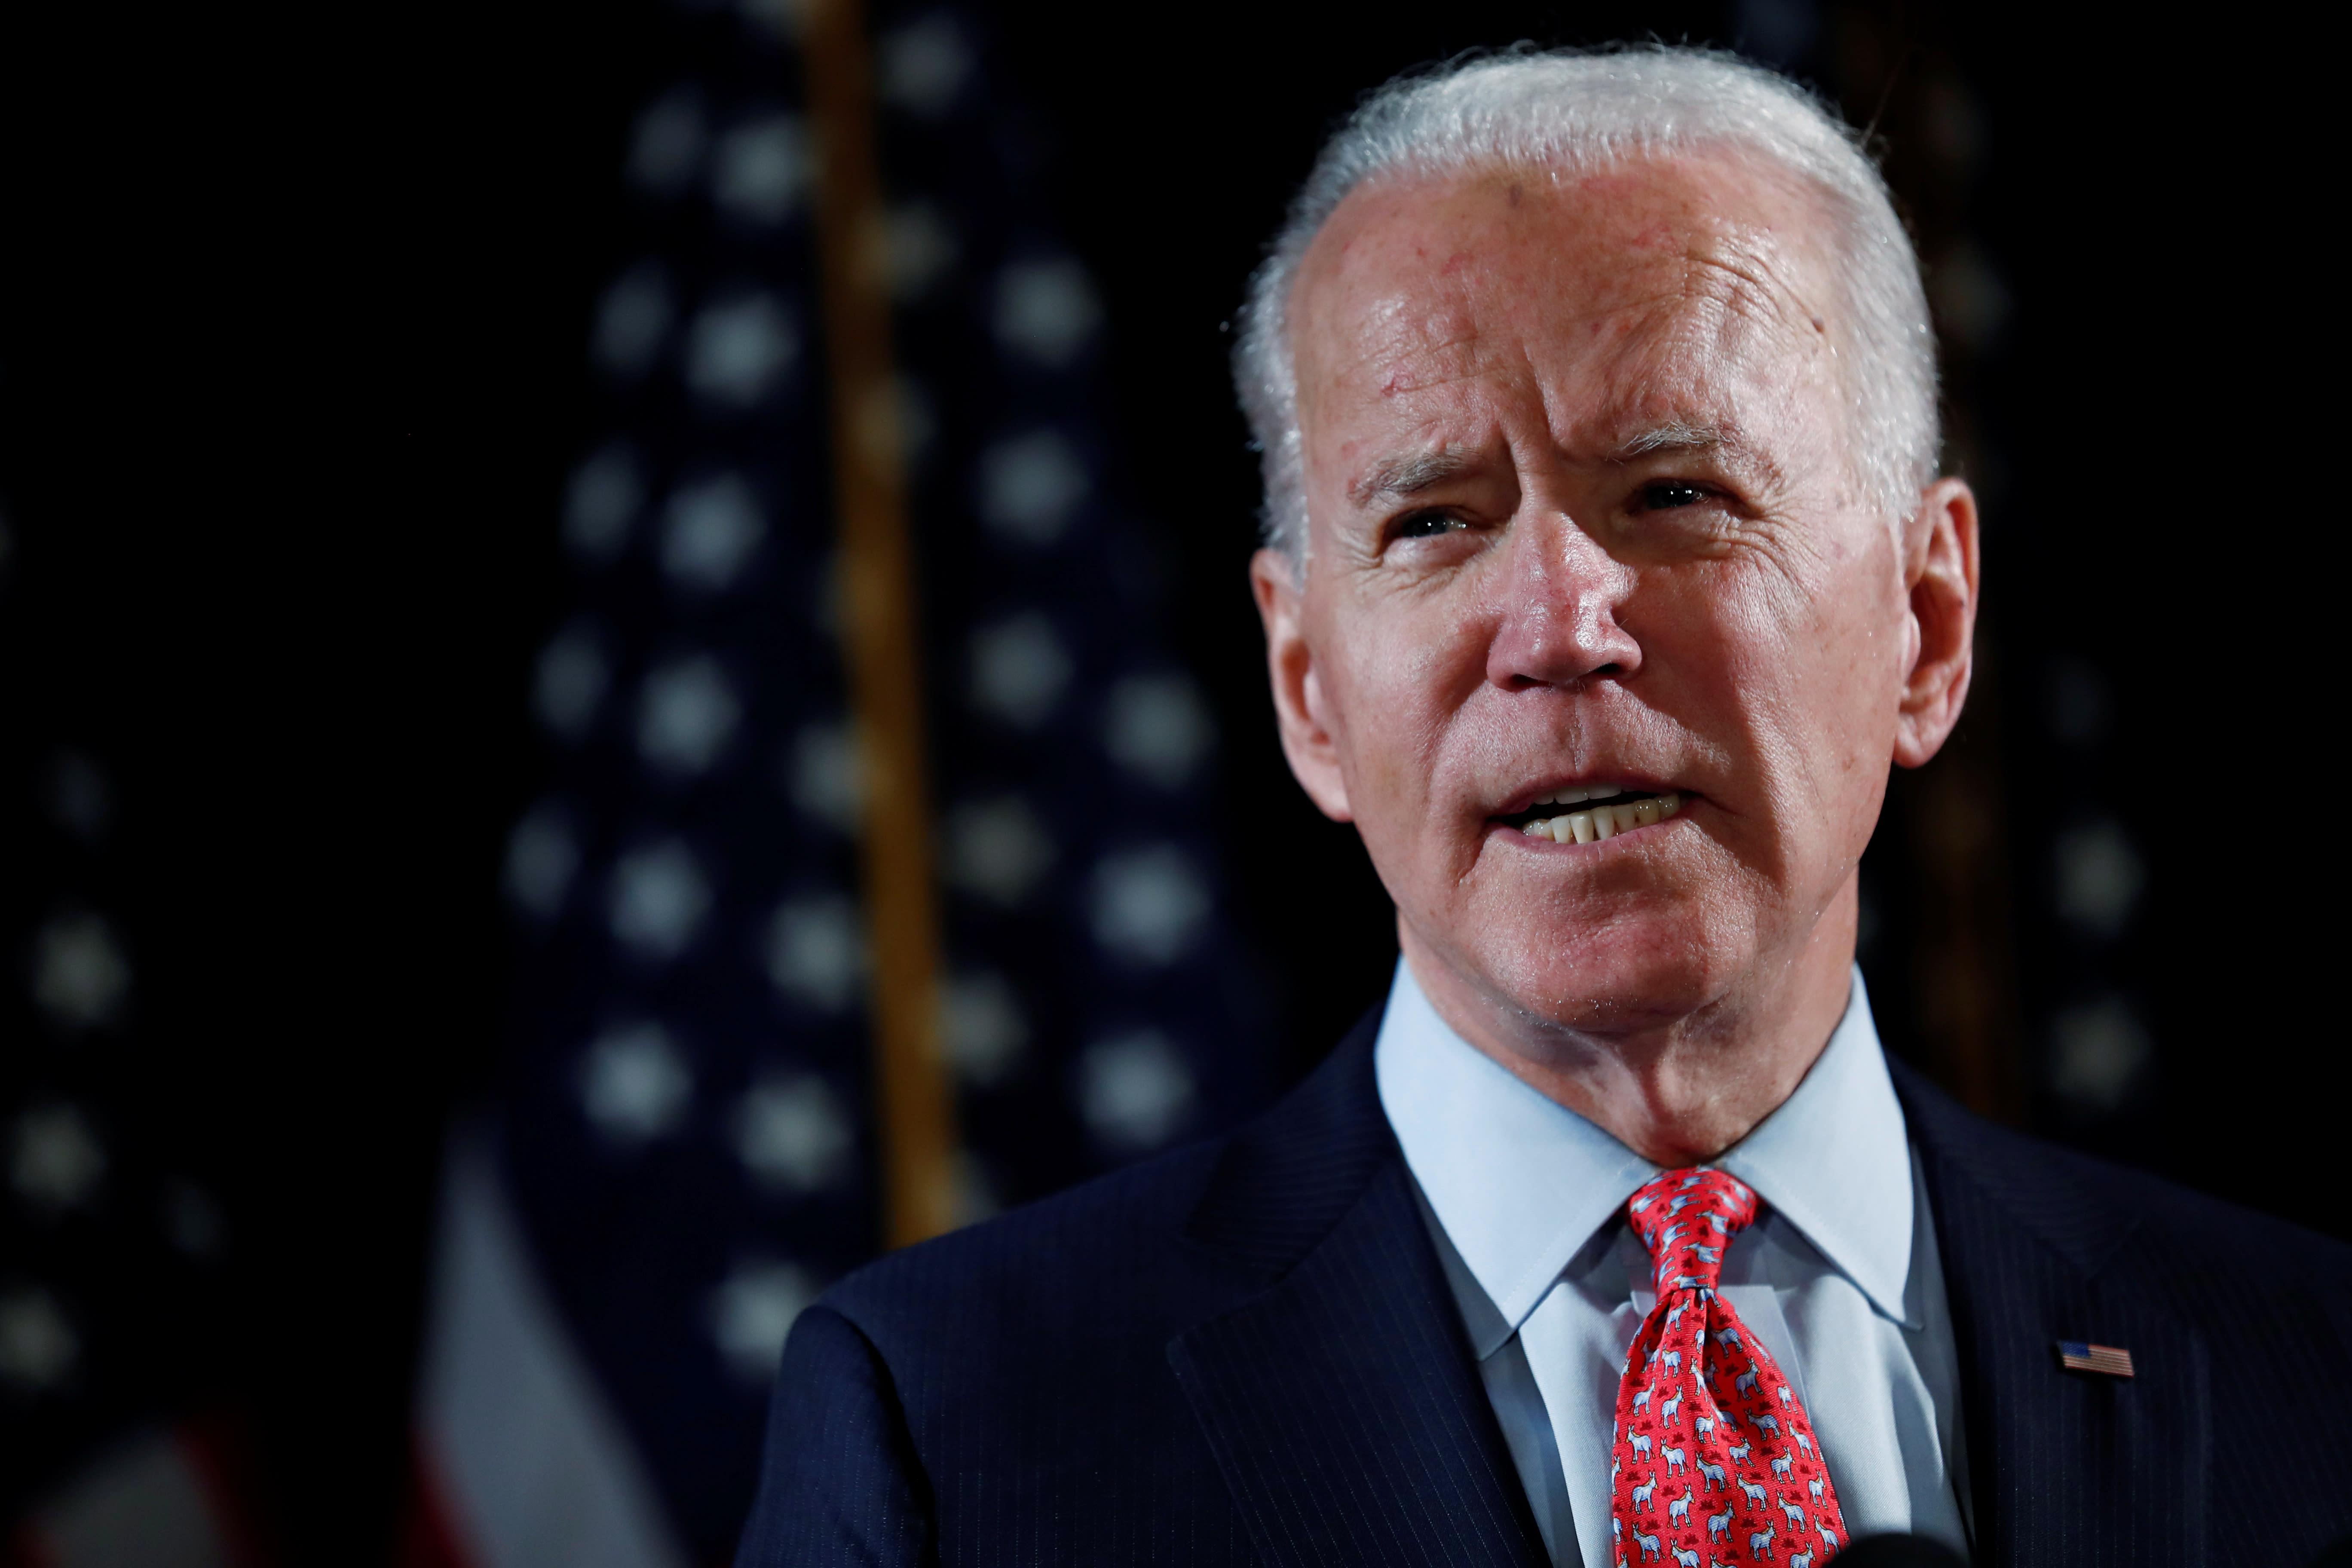 Biden and other Democrats blast Trump's health care rejection amid coronavirus